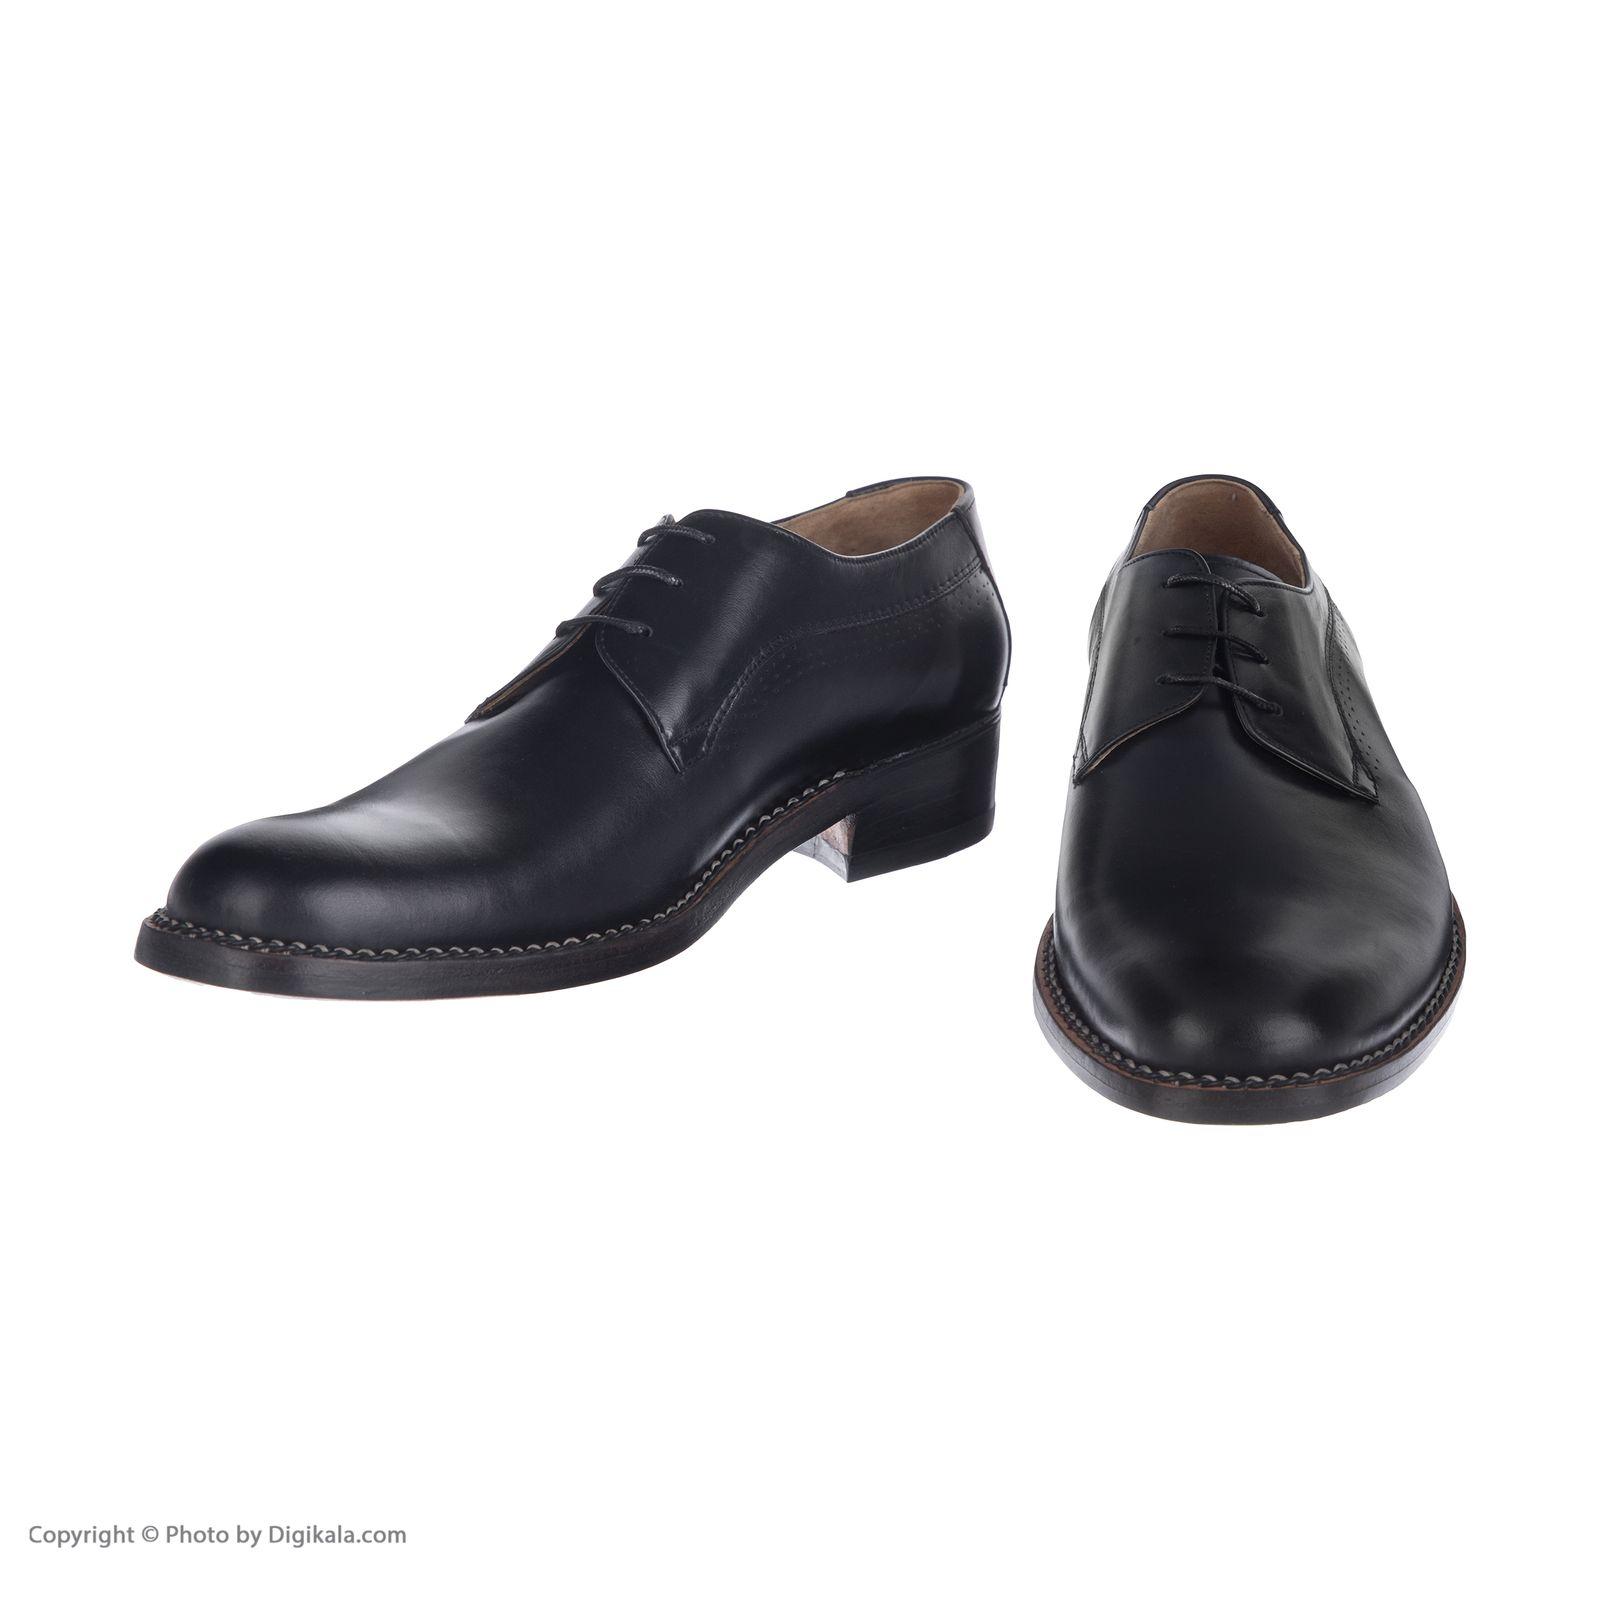 کفش مردانه نظری کد 405 -  - 4